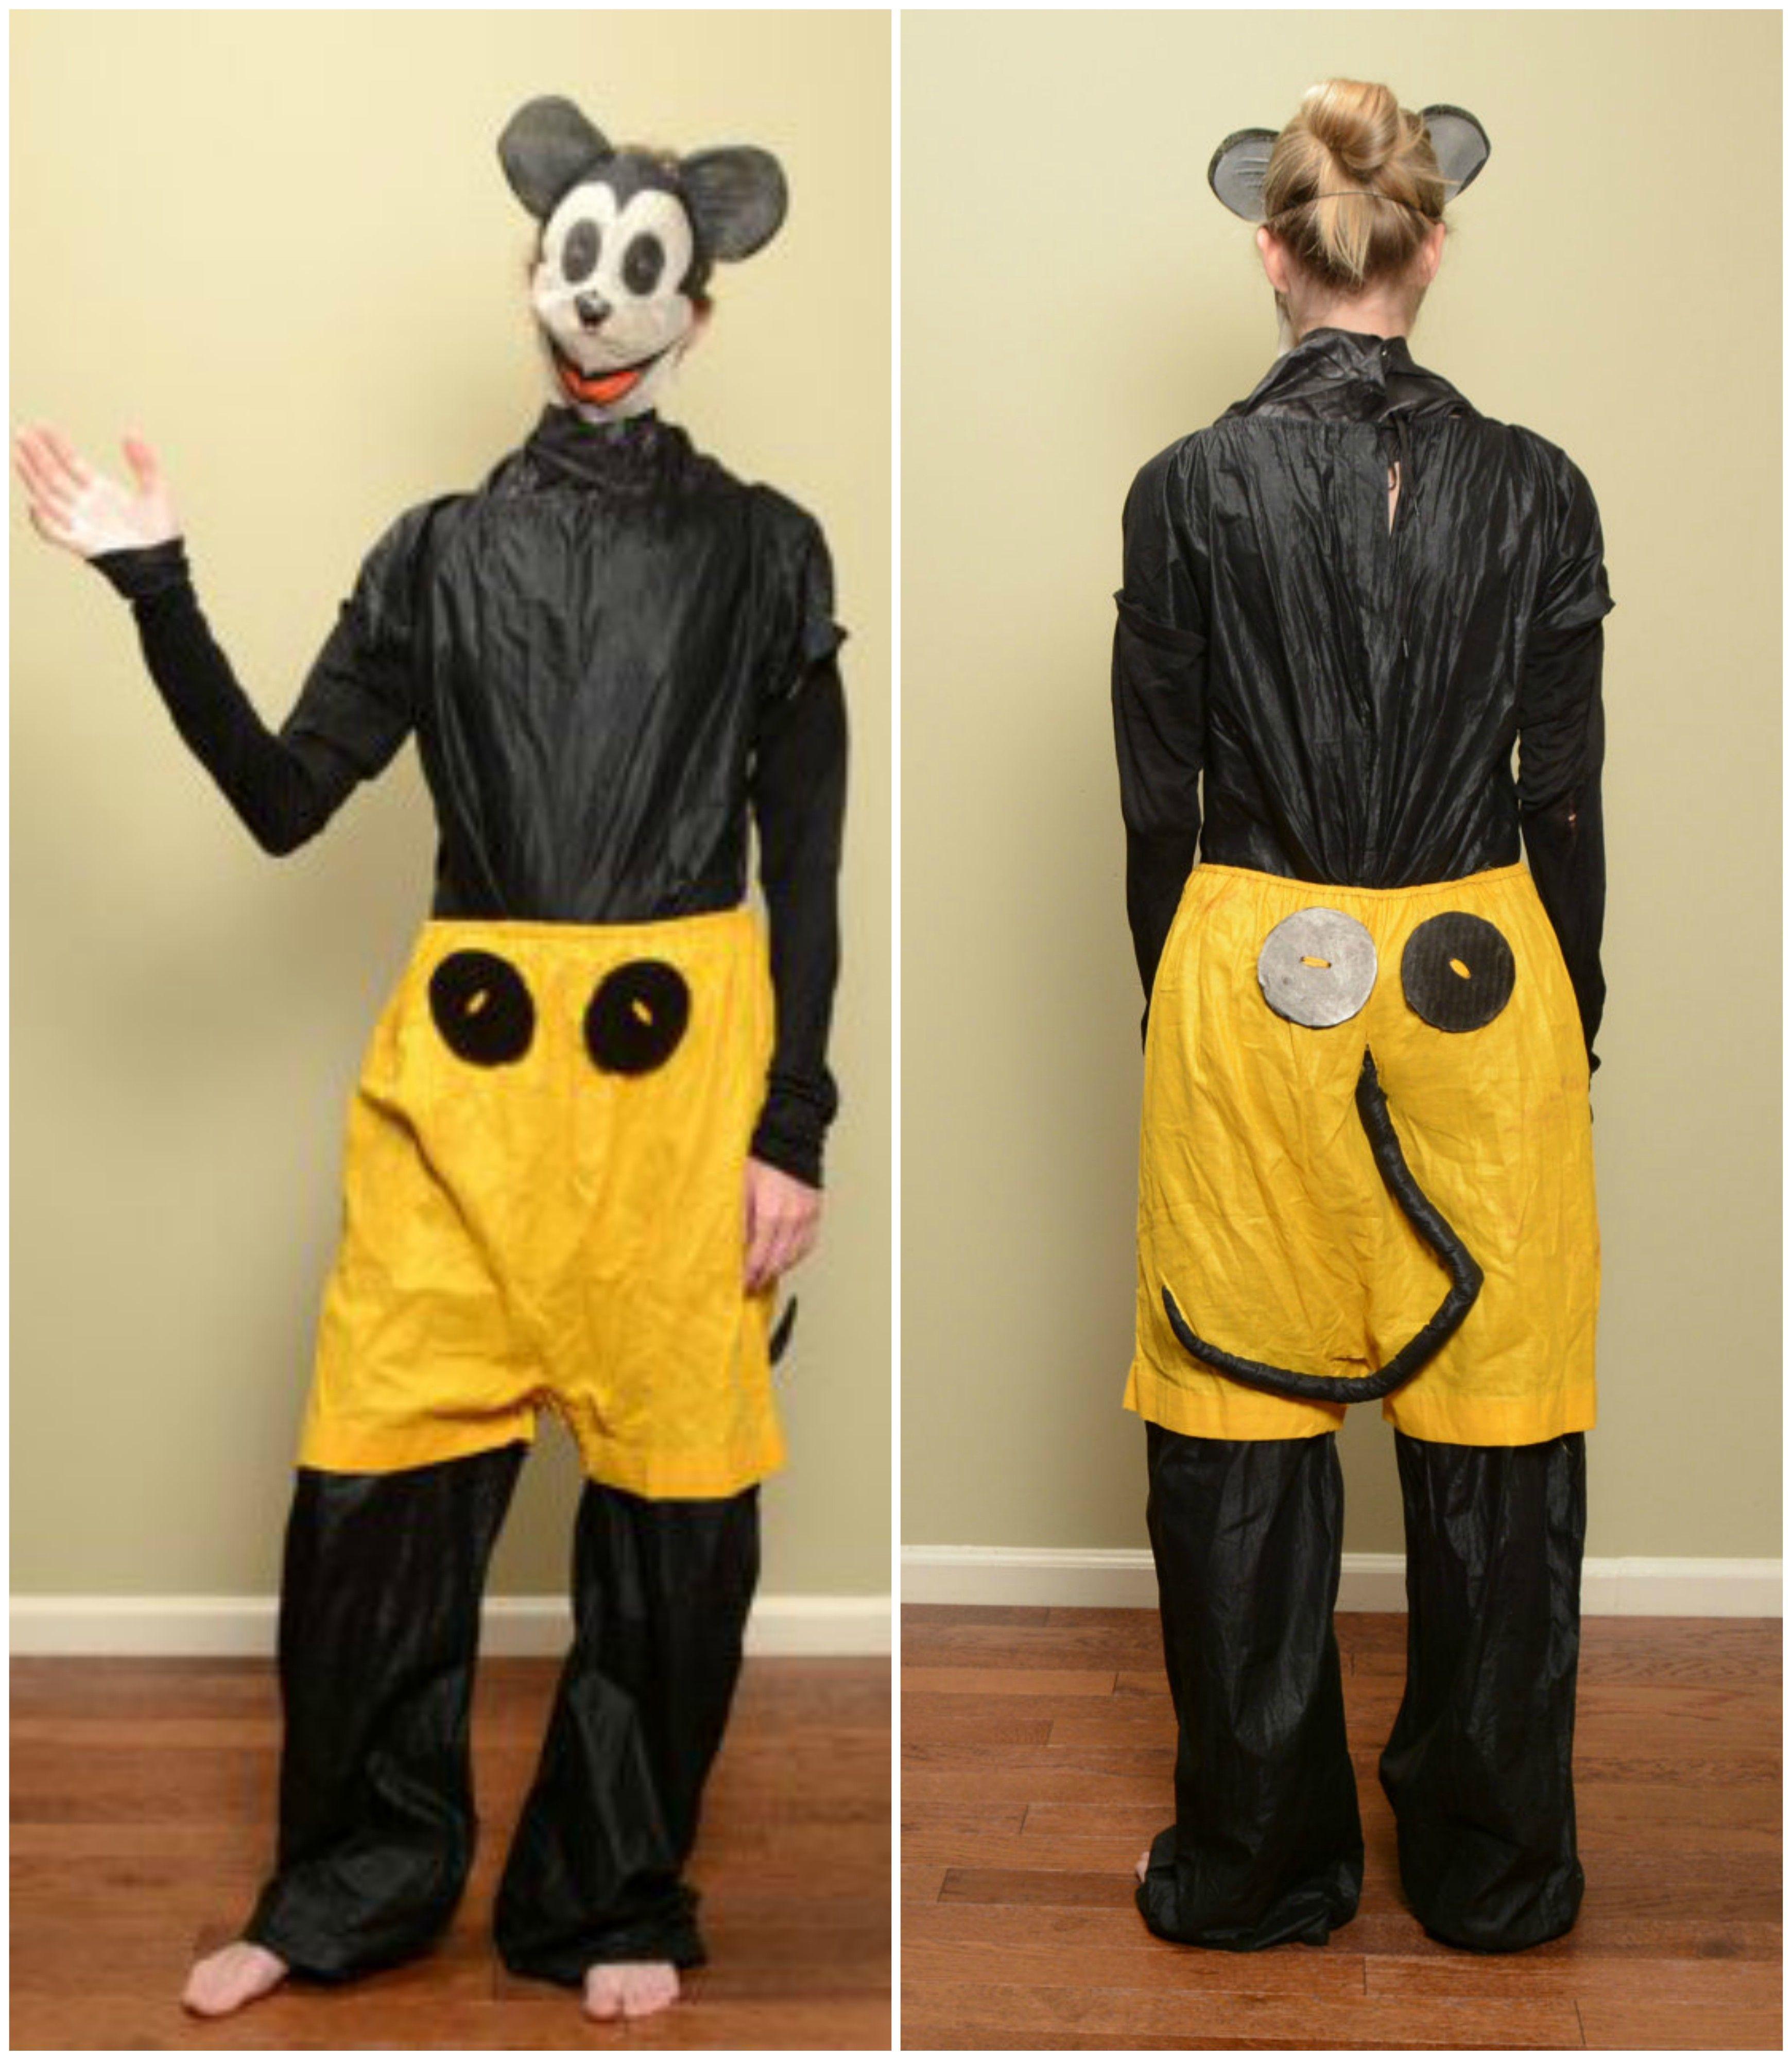 Vintage Mickey Mouse costume 1930s Spotlite Costumes mesh gauze ...